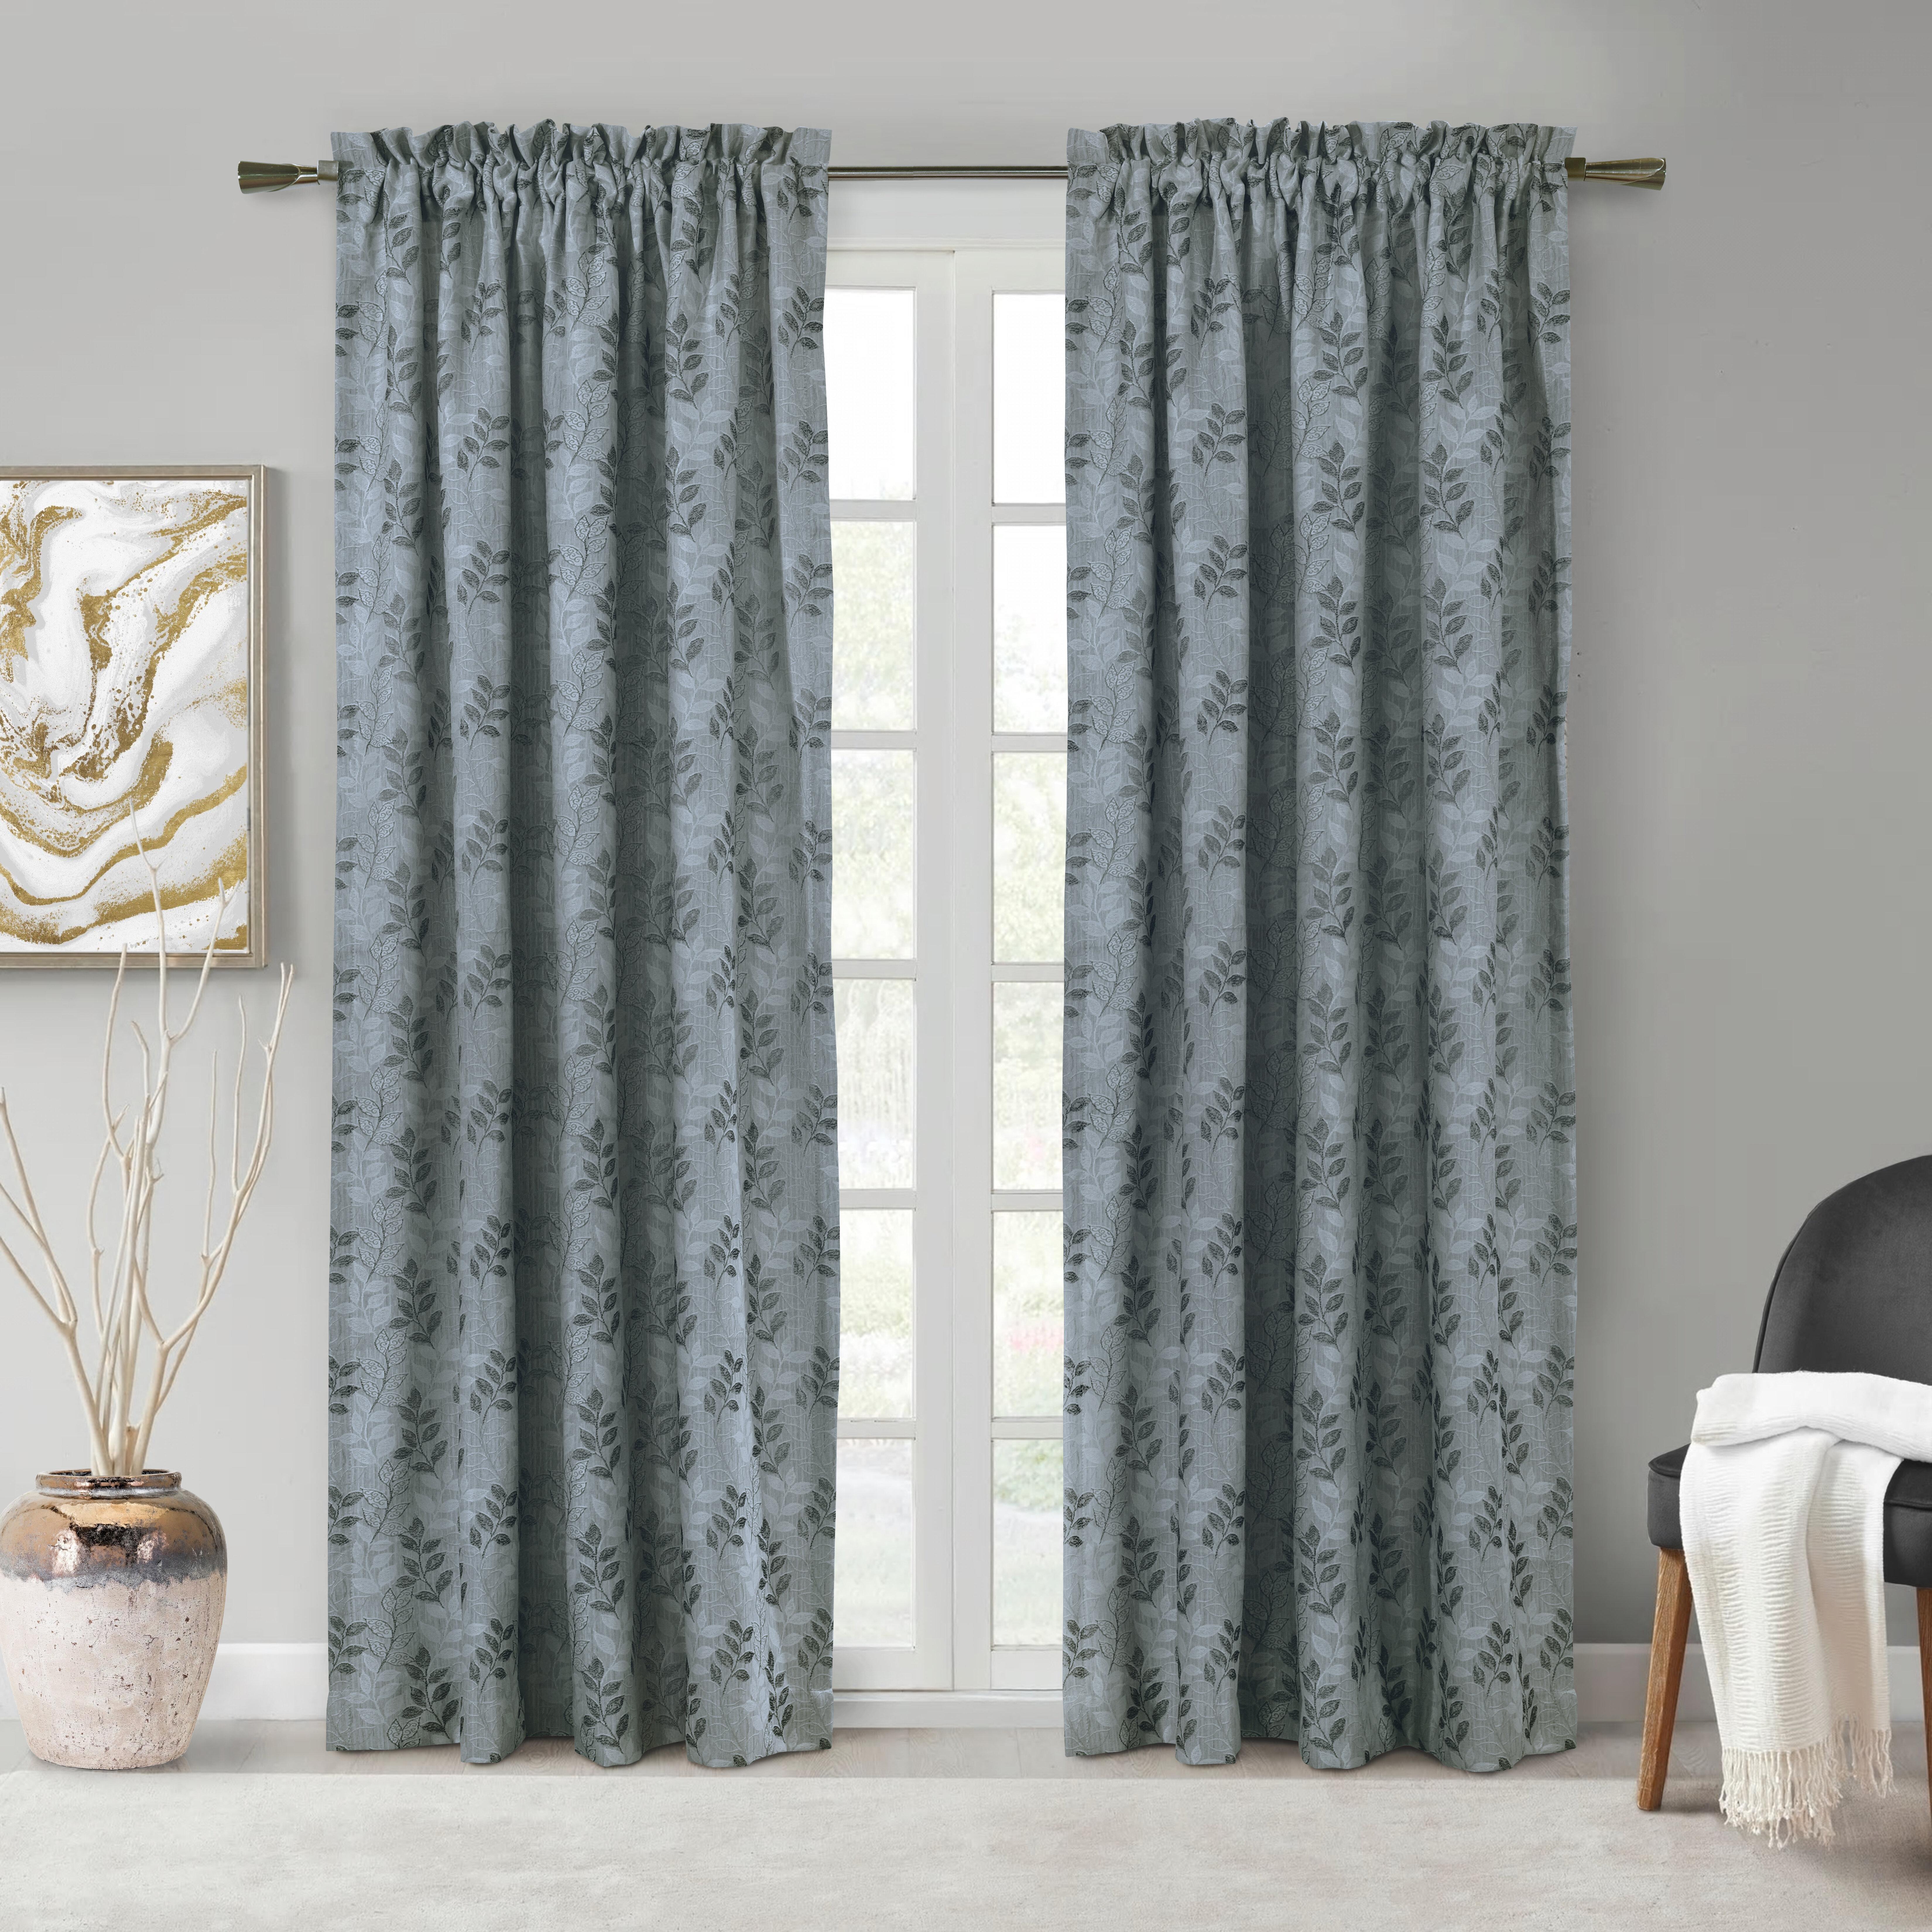 Gracie Oaks Ansonia Floral Room Darkening Rod Pocket Curtain Panels Reviews Wayfair